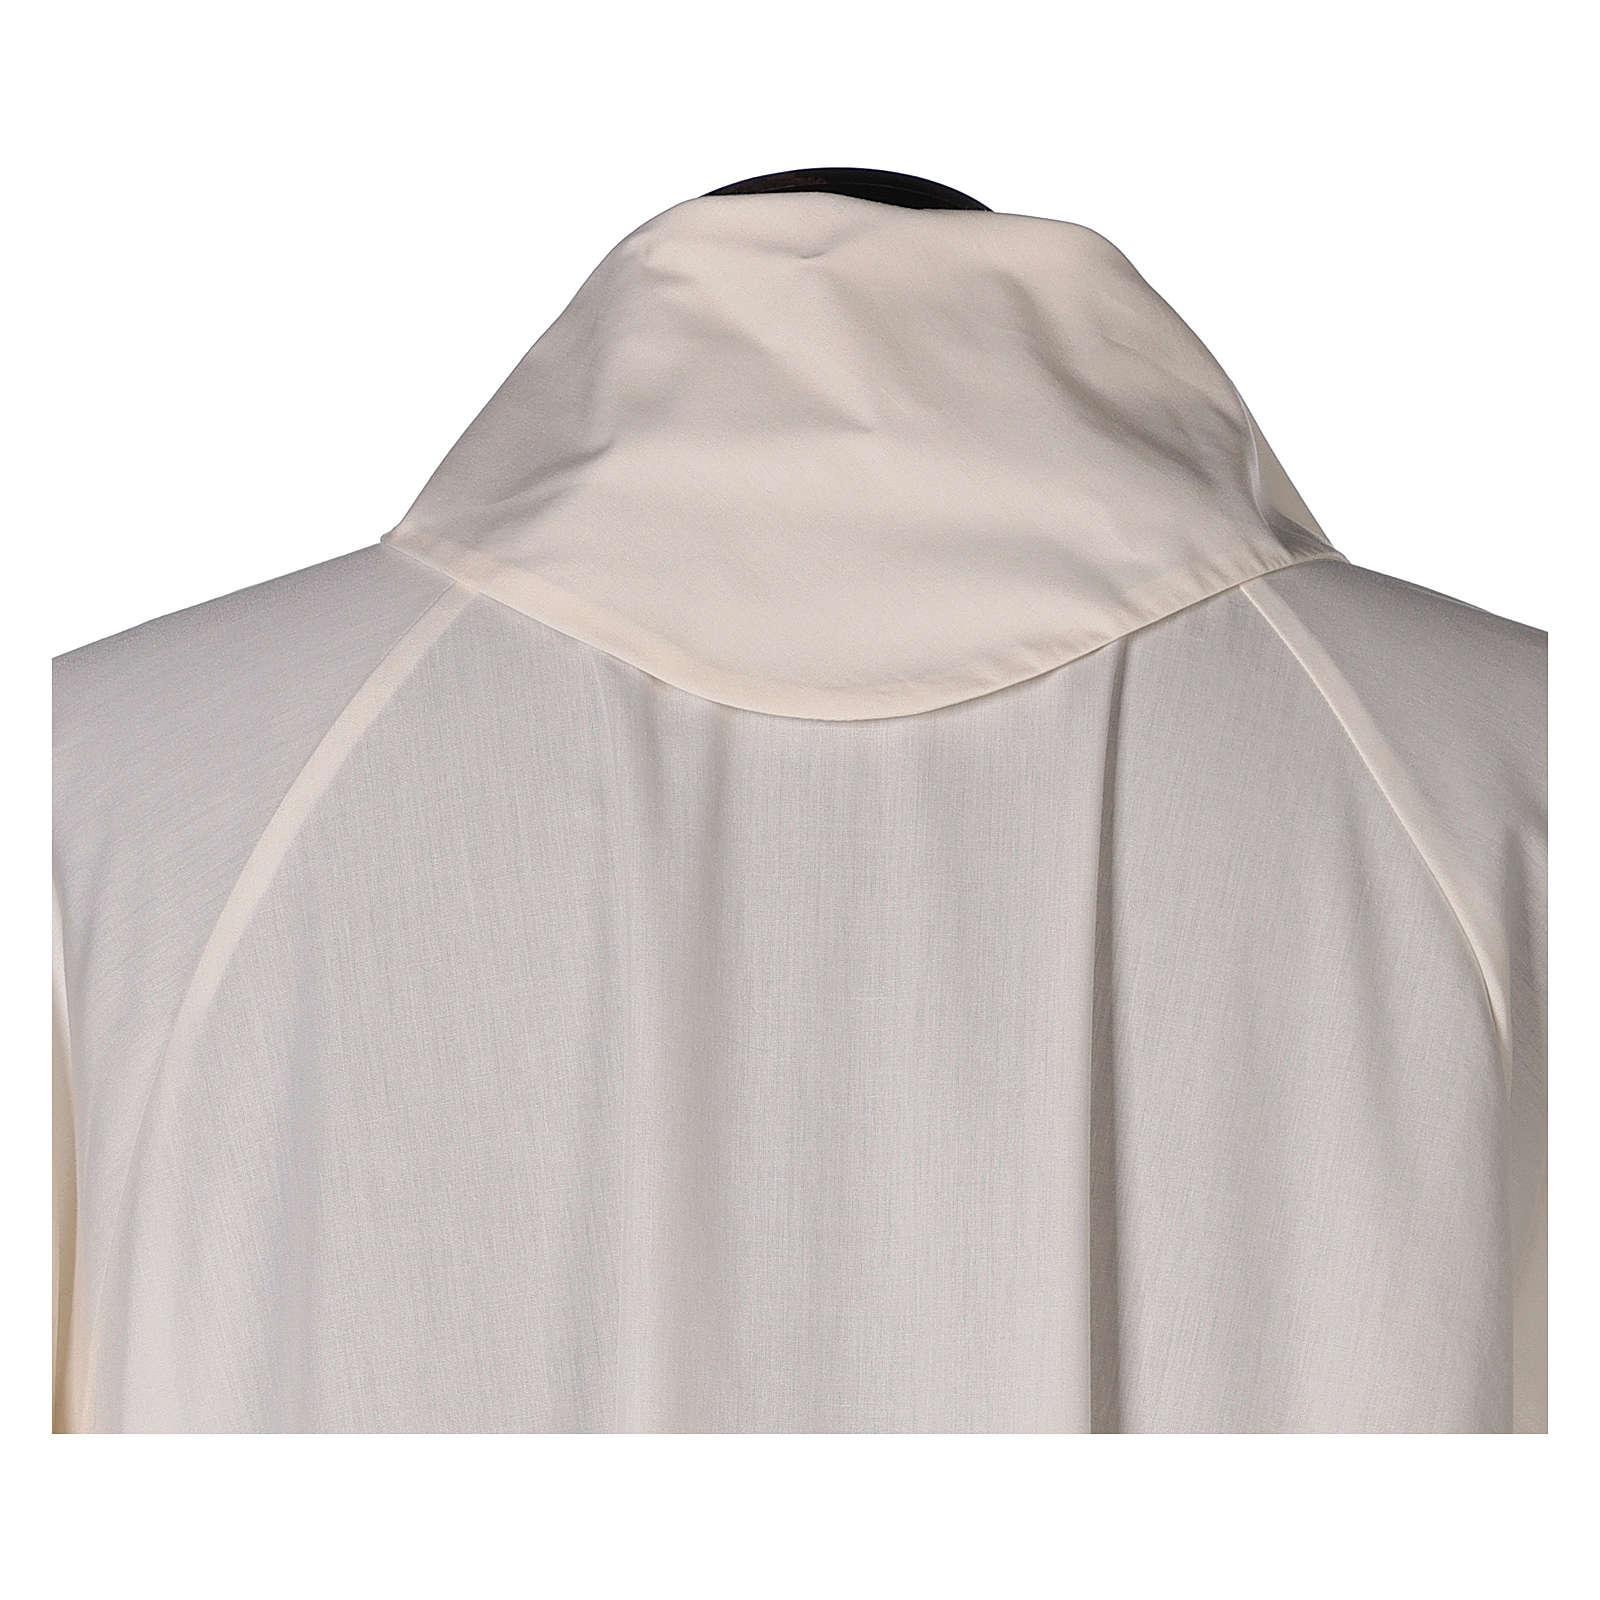 Alba marfil 65% poliéster 35% algodón falsa capucha 4